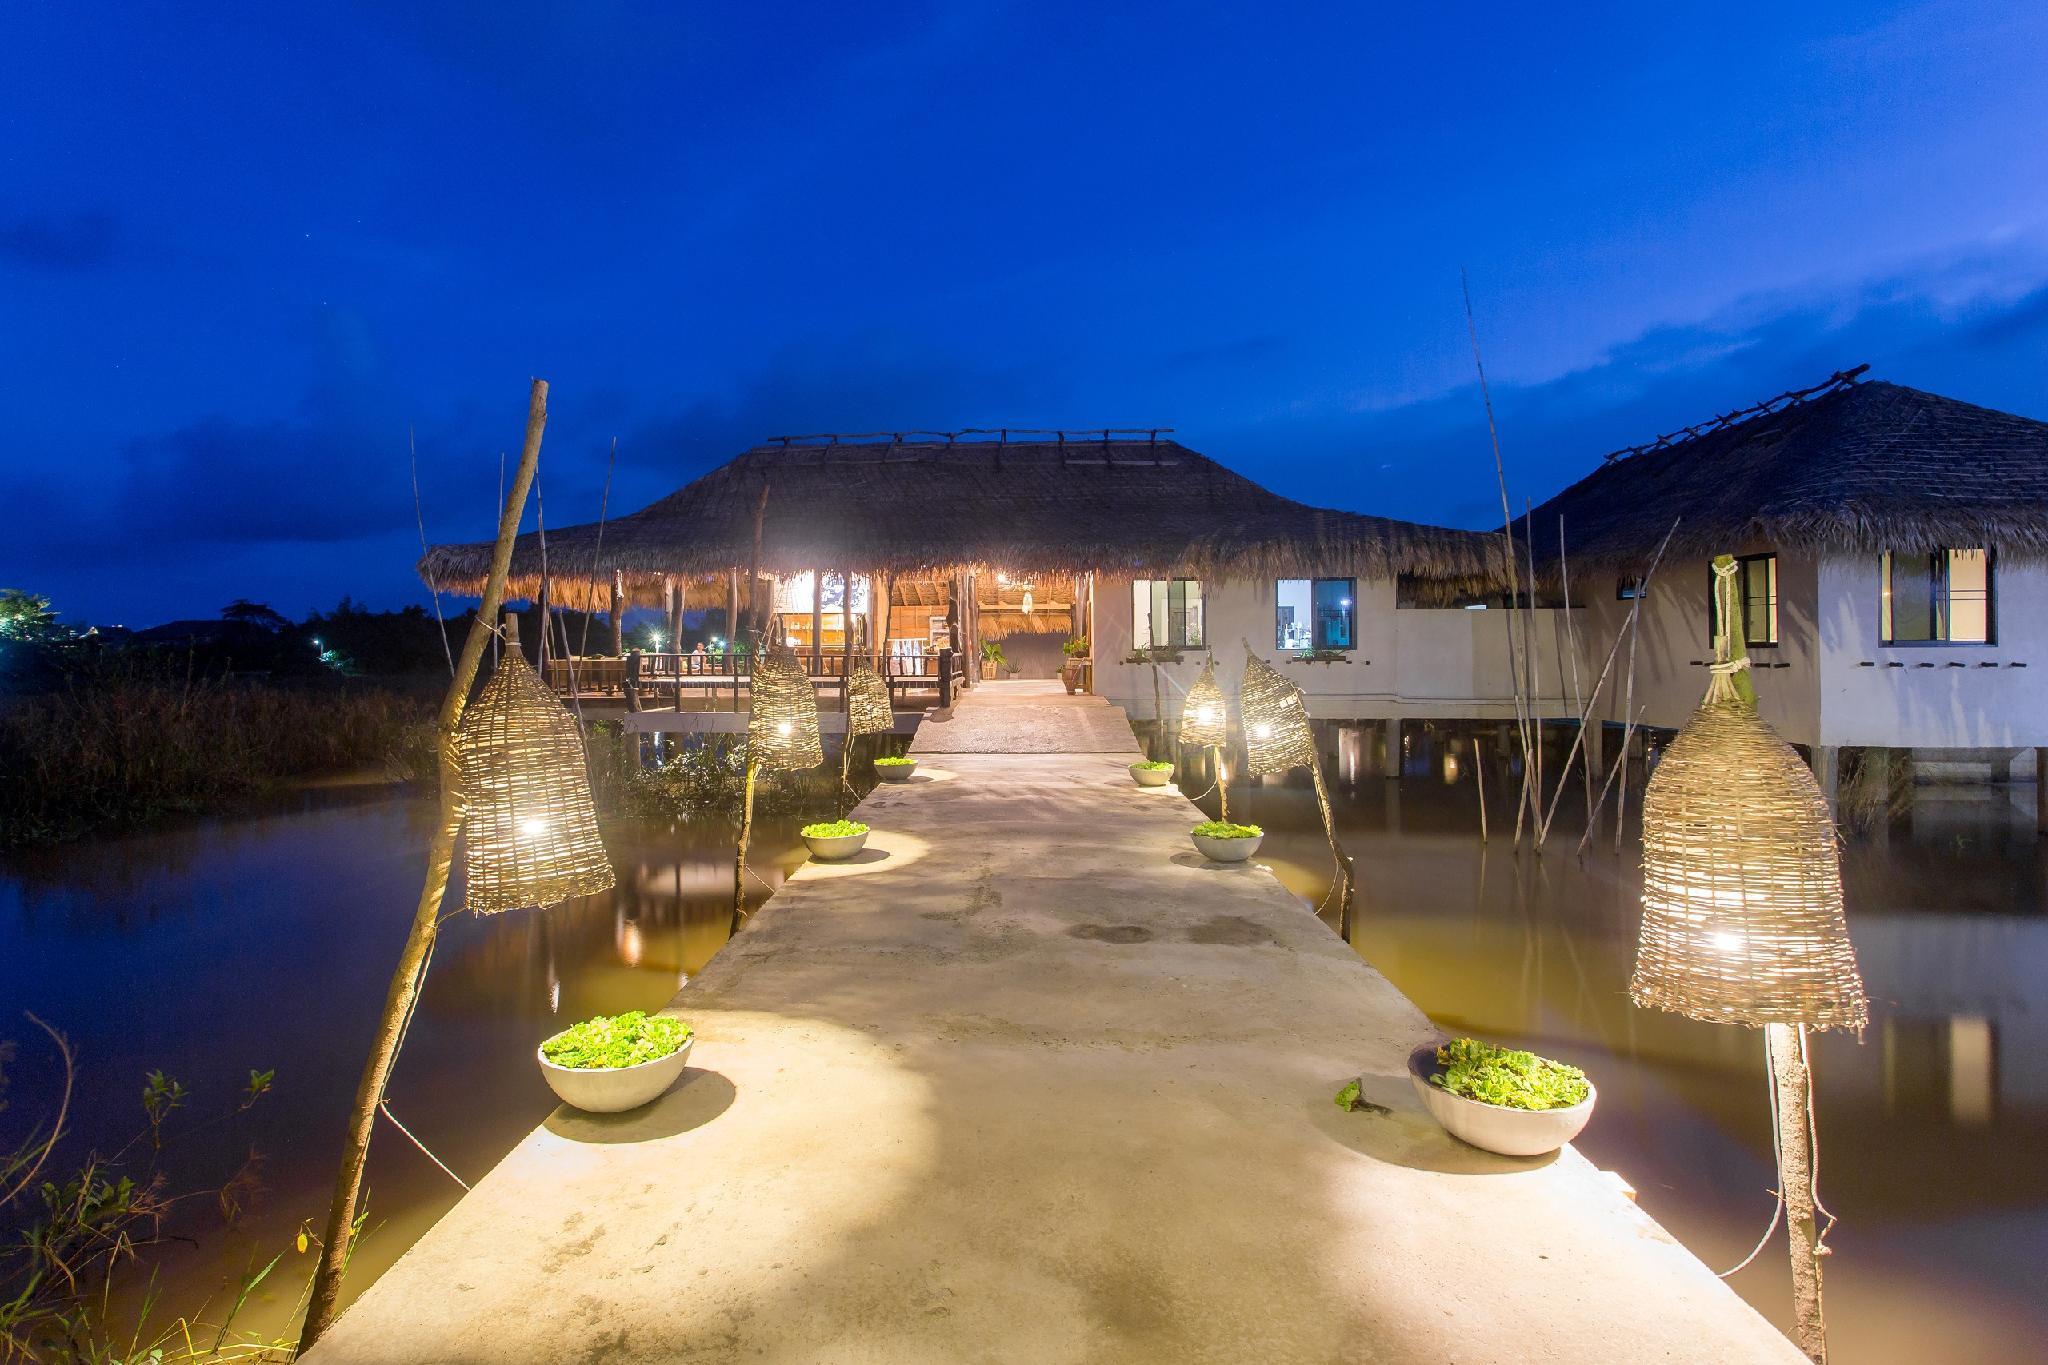 Sripakpra Andacura Boutique Resort Phattalung,ศรีปากประ อันดาคูรา บูติก รีสอร์ต พัทลุง